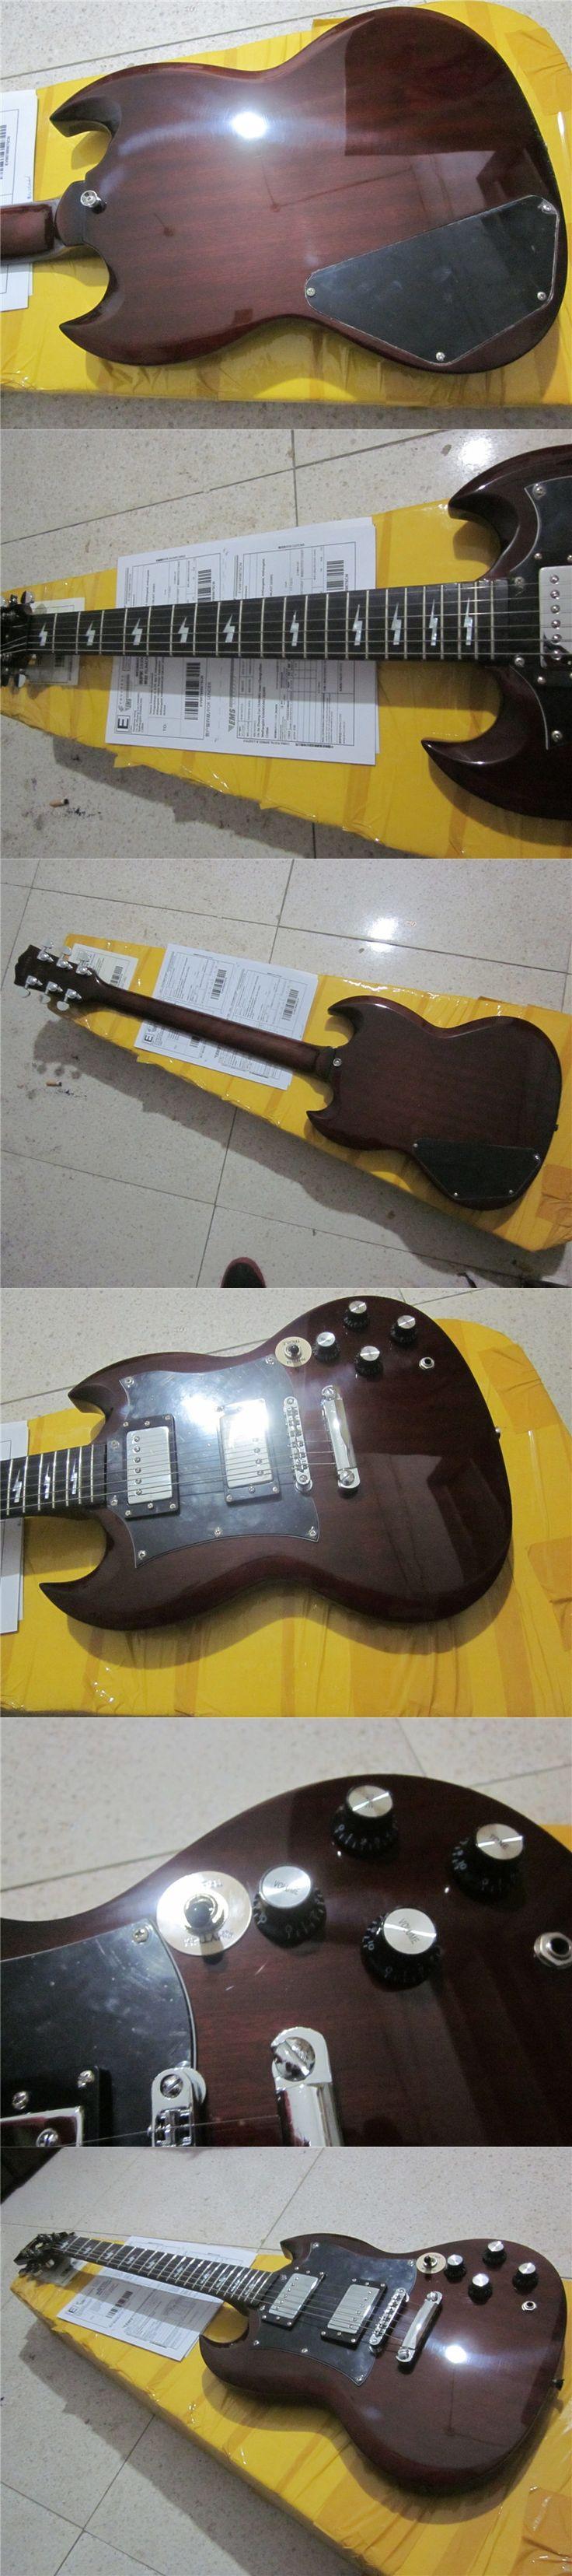 Electric GUITAR 2016 new LP g400 sg electric GUITAR CHINA